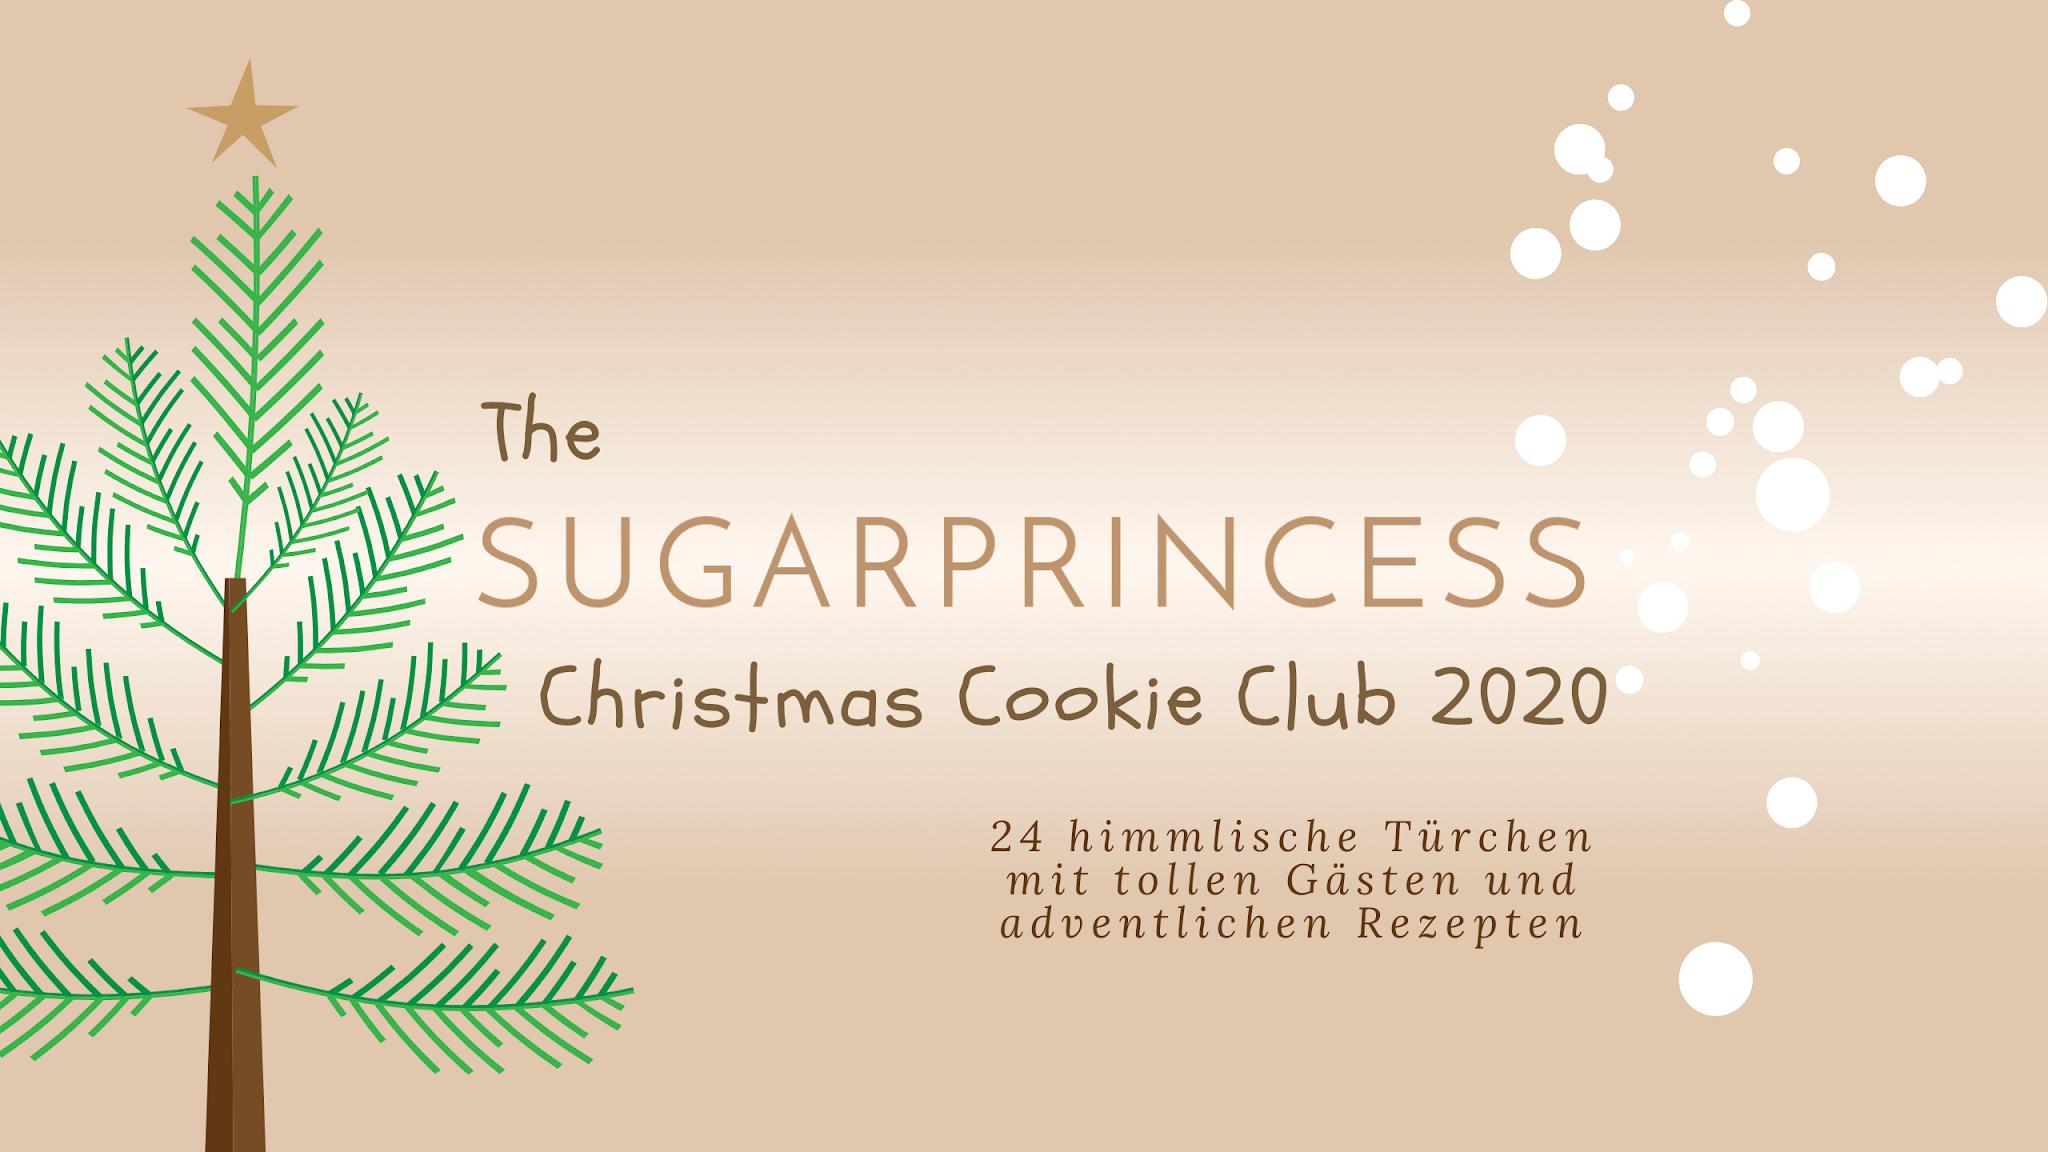 Der große Foodadventskalender The Sugarprincess Christmas Cookie Club 2020 ist gestartet | Gewinnspiel Ankündigung